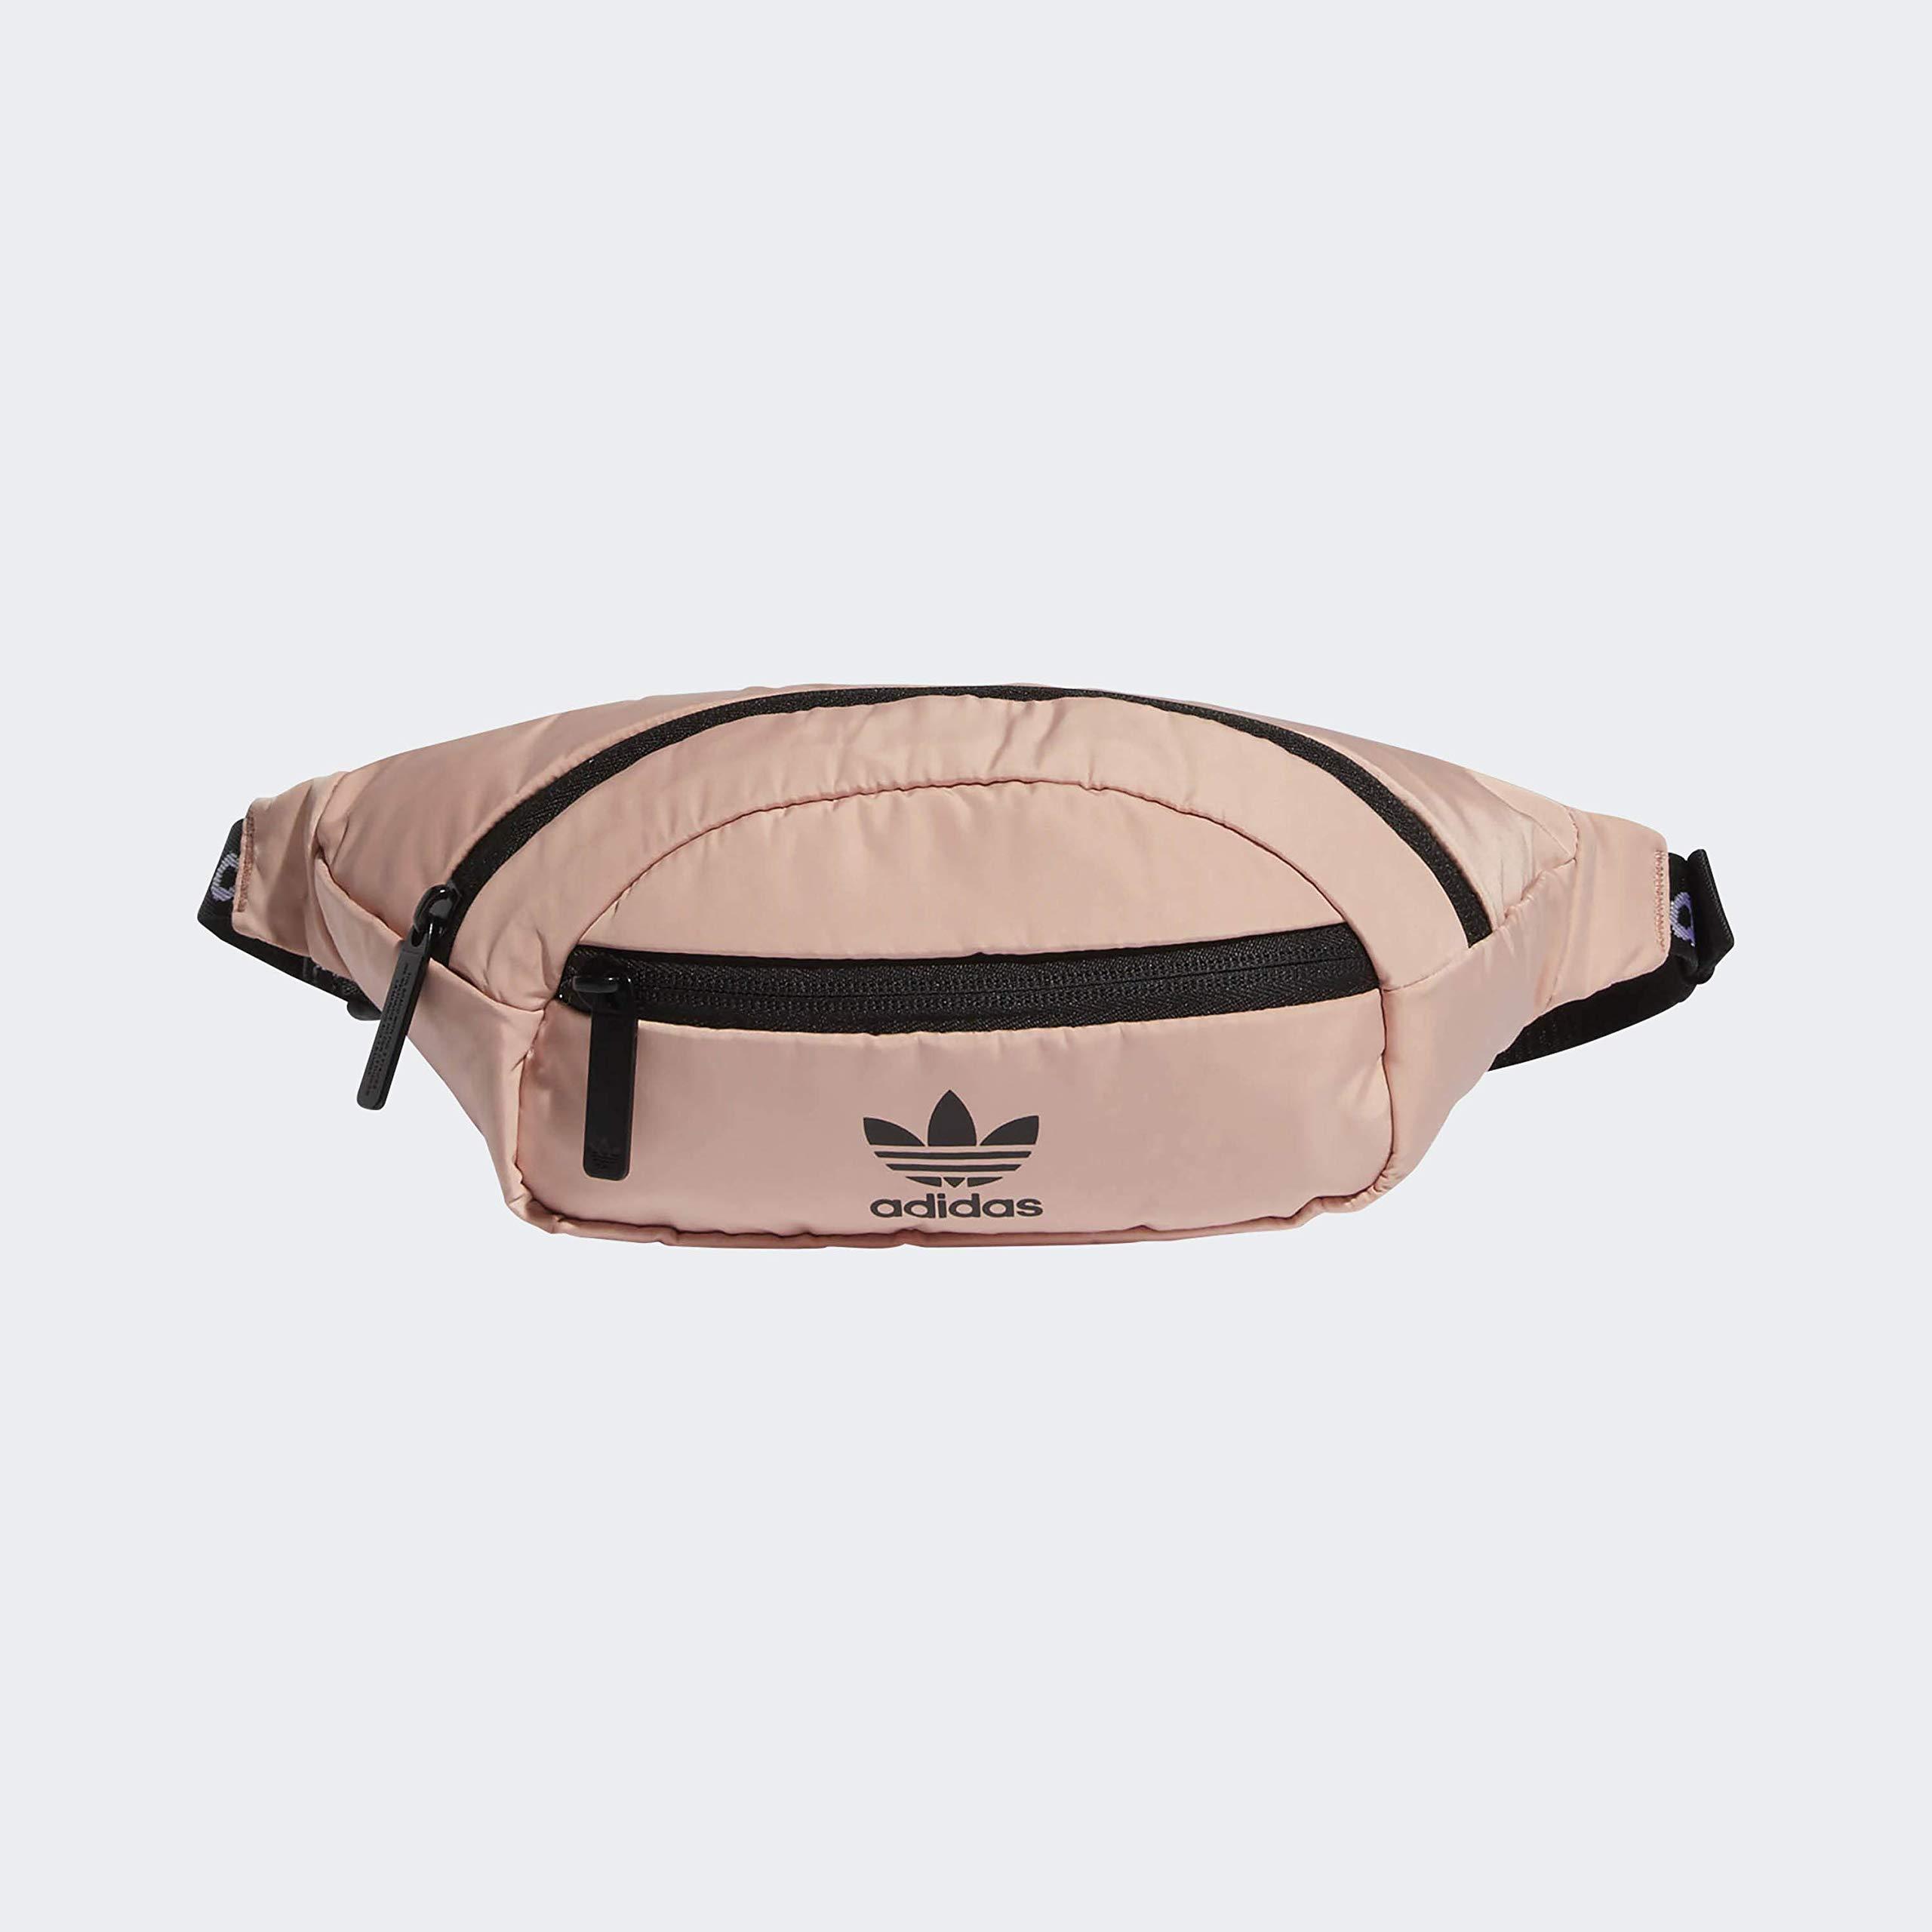 adidas Originals Unisex National Waist Pack, Dust Pink/Black, ONE SIZE by adidas Originals